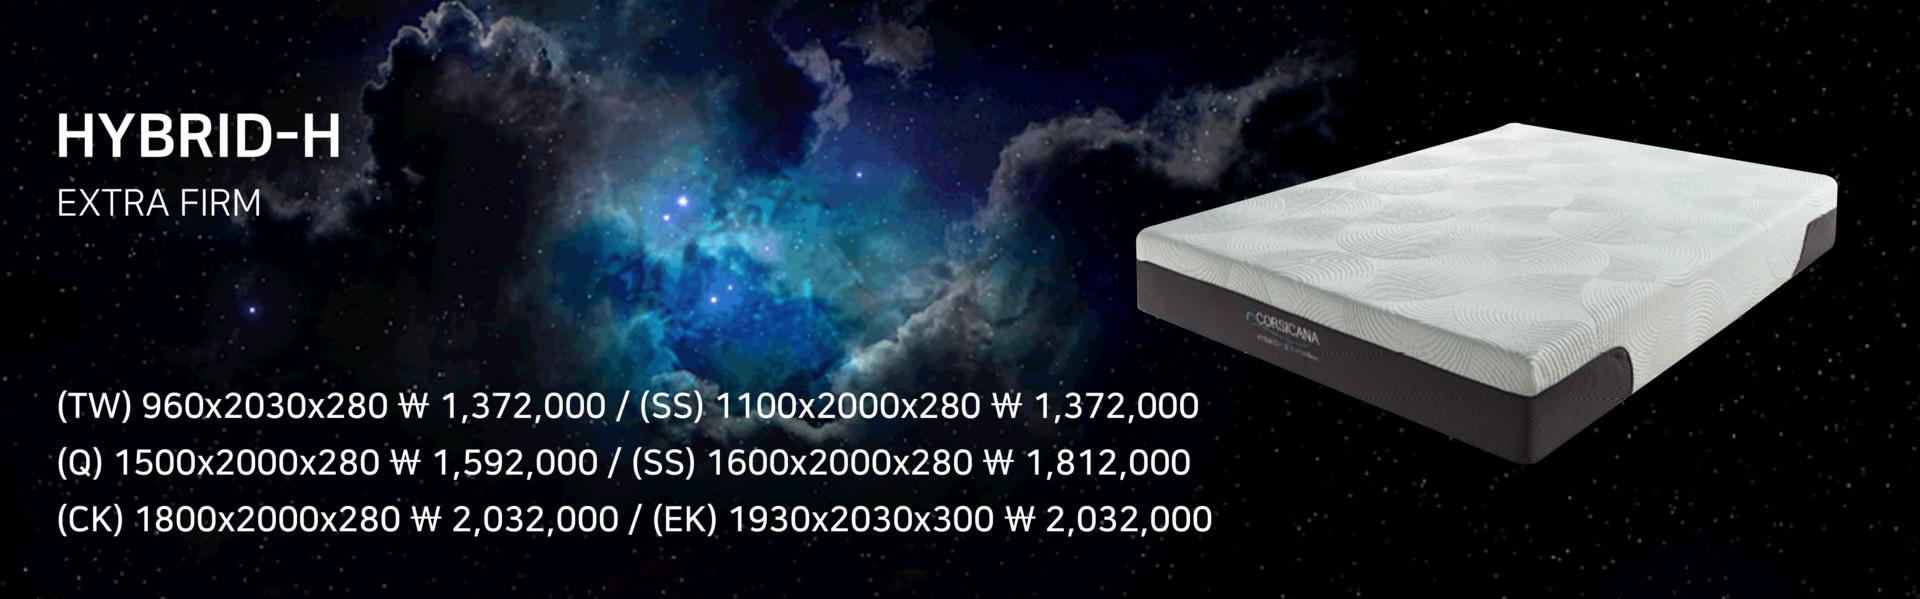 "<font size=""3px""><b>HYBRID-H<b></font><BR><FONT SIZE=""1PX"">EXTRA FIRM</FONT> <BR><br><font size=""0.5px""> (TW) 960x2030x280 ₩1,372,000  /  (SS) 1100x2000x280 ₩1,372,000 <br> (Q) 1500x2000x280 ₩1,592,000  /  (K) 1600x2000x280 ₩1,812,000    <br>(CK) 1800x2000x280 ₩2,032,000  /  (EK) 1930x2030x280 ₩2,032,000</font>"